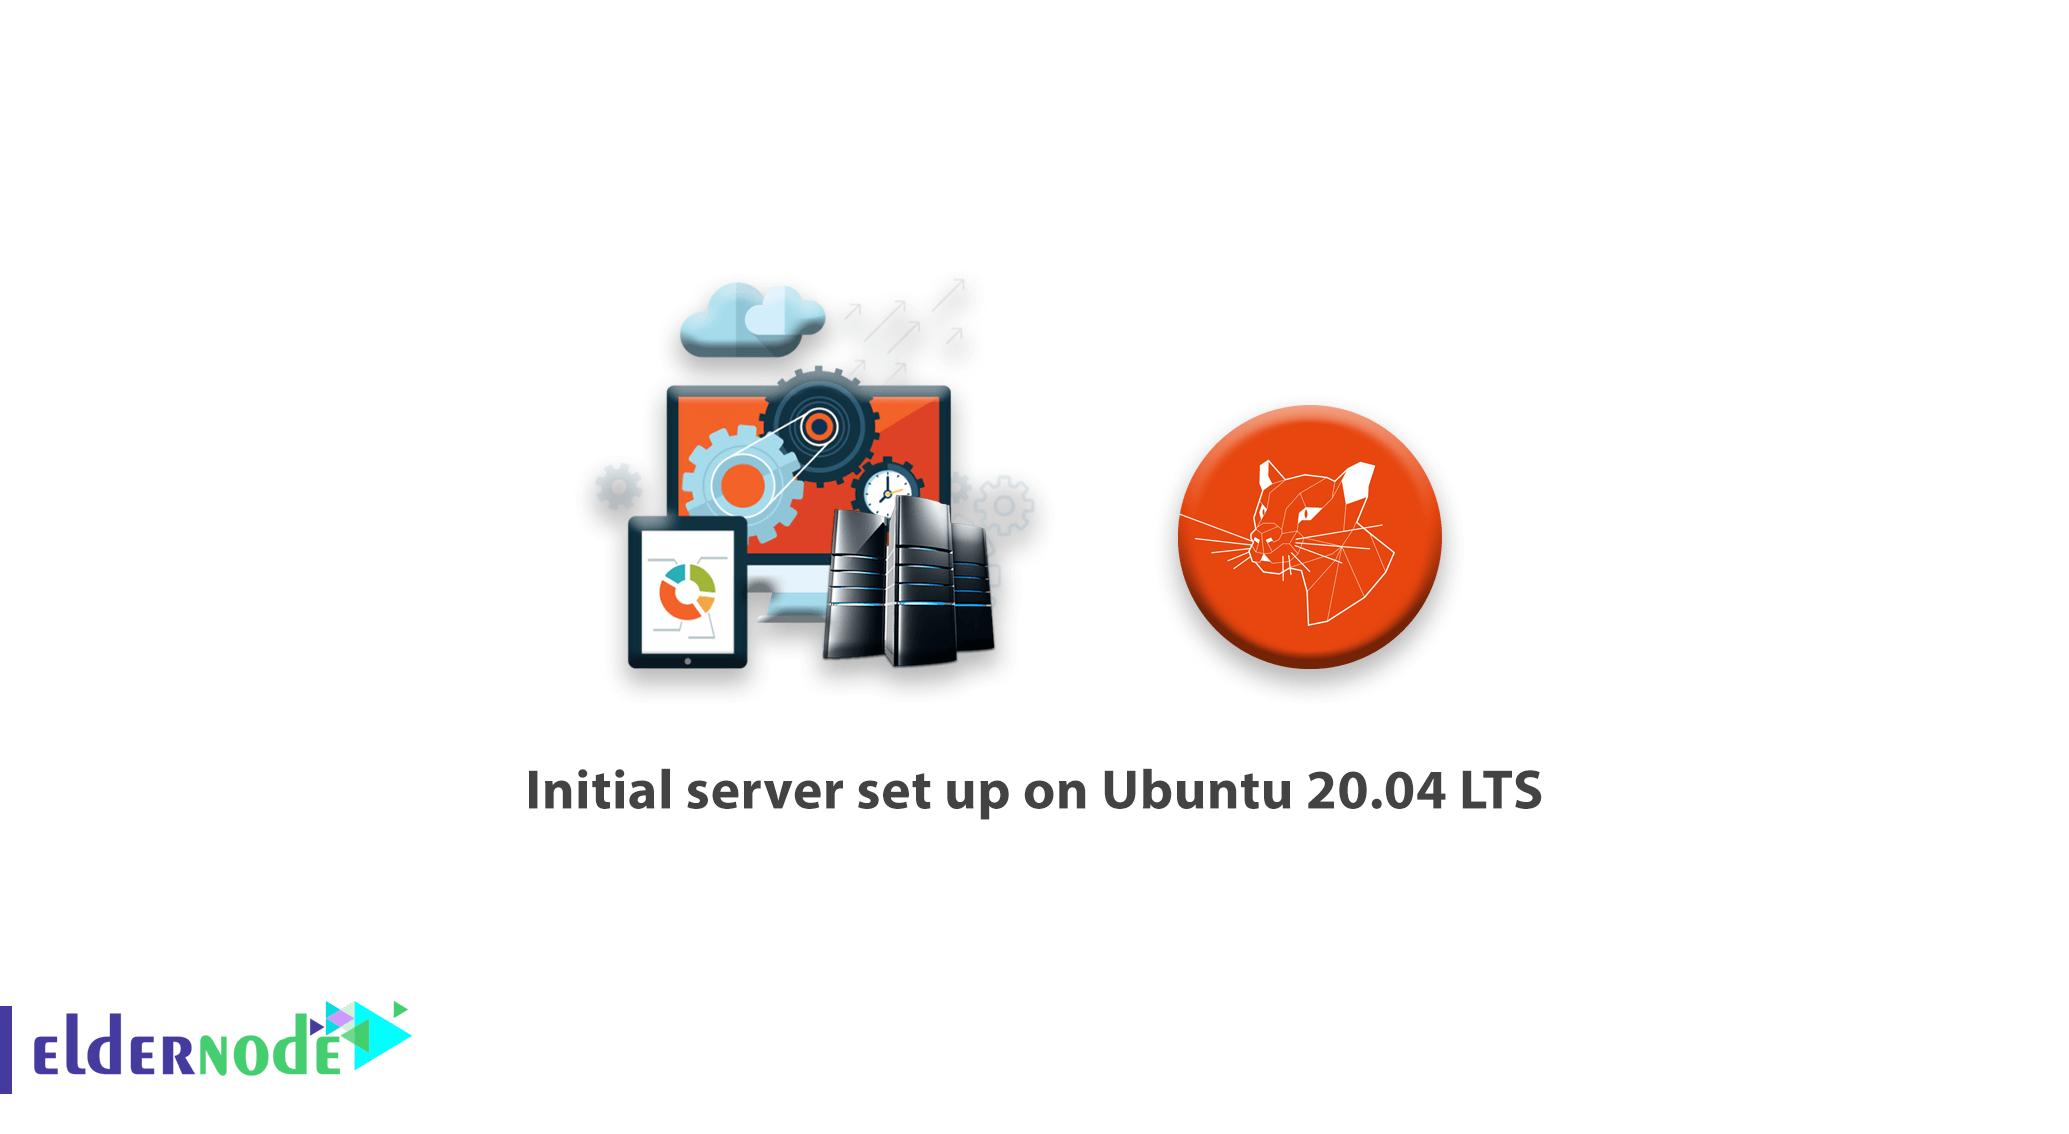 Initial server set up on Ubuntu 20.04 LTS